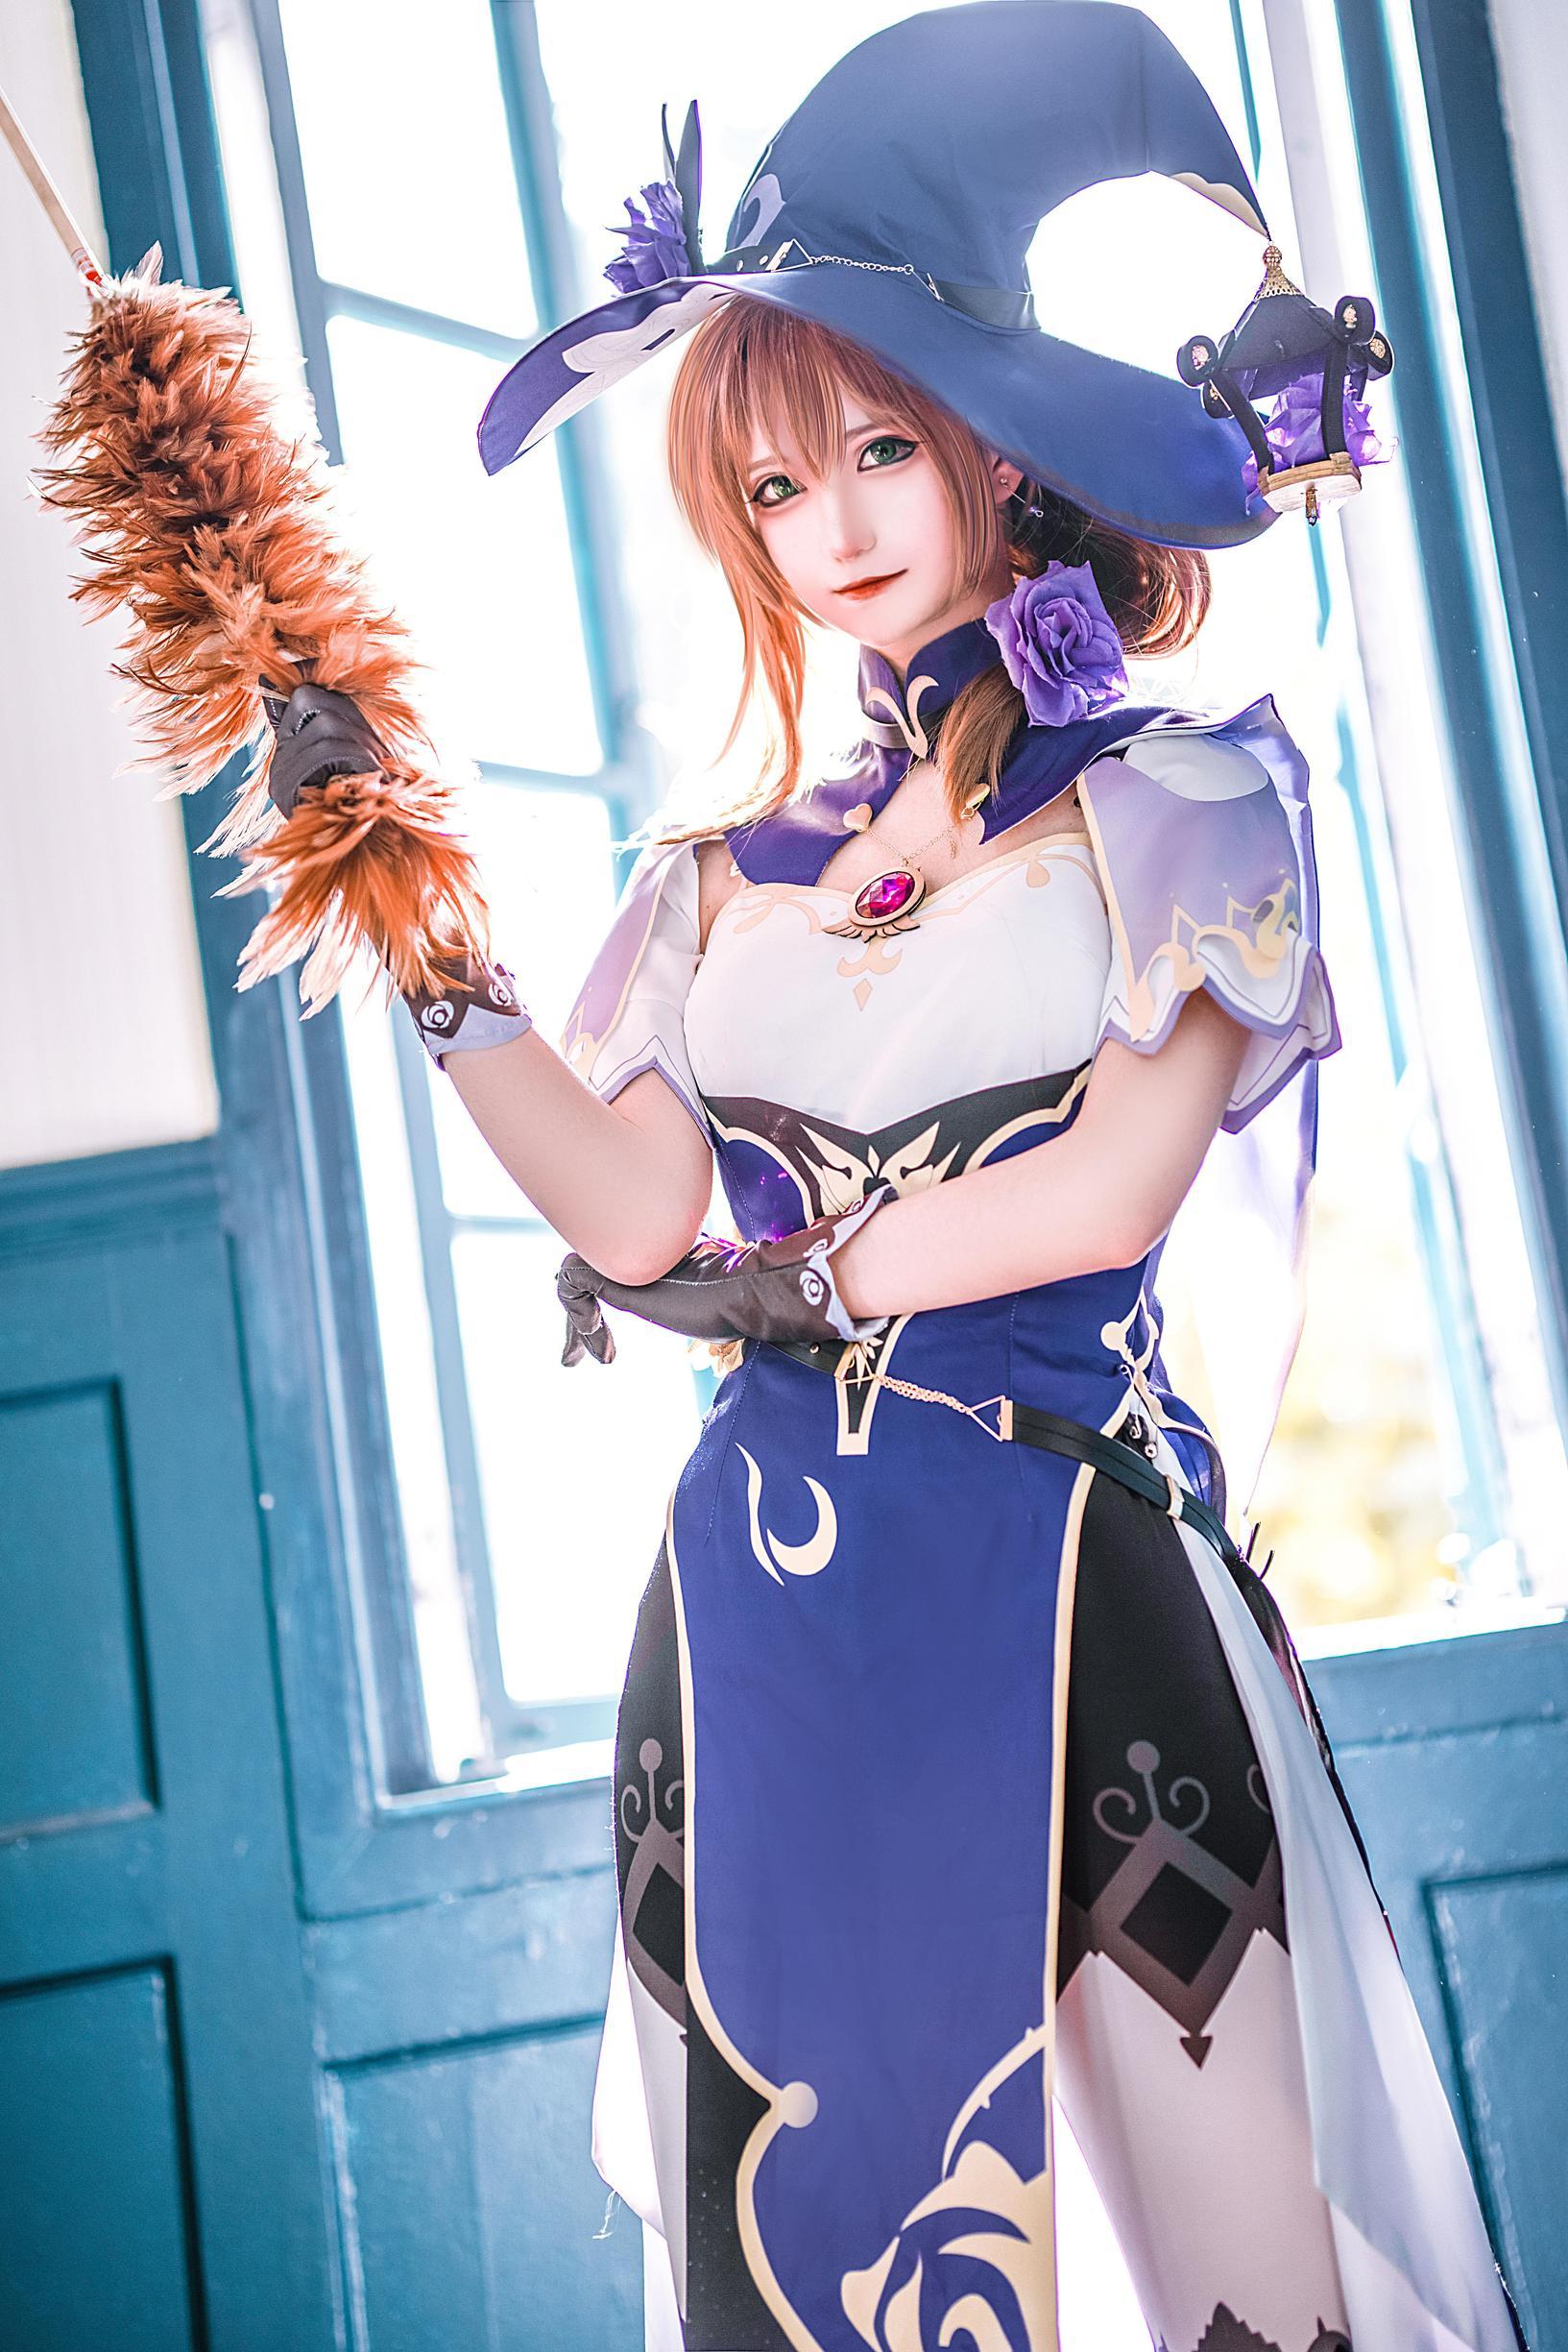 《原神》御姐cosplay【CN:南千鲤Akirui】-第3张